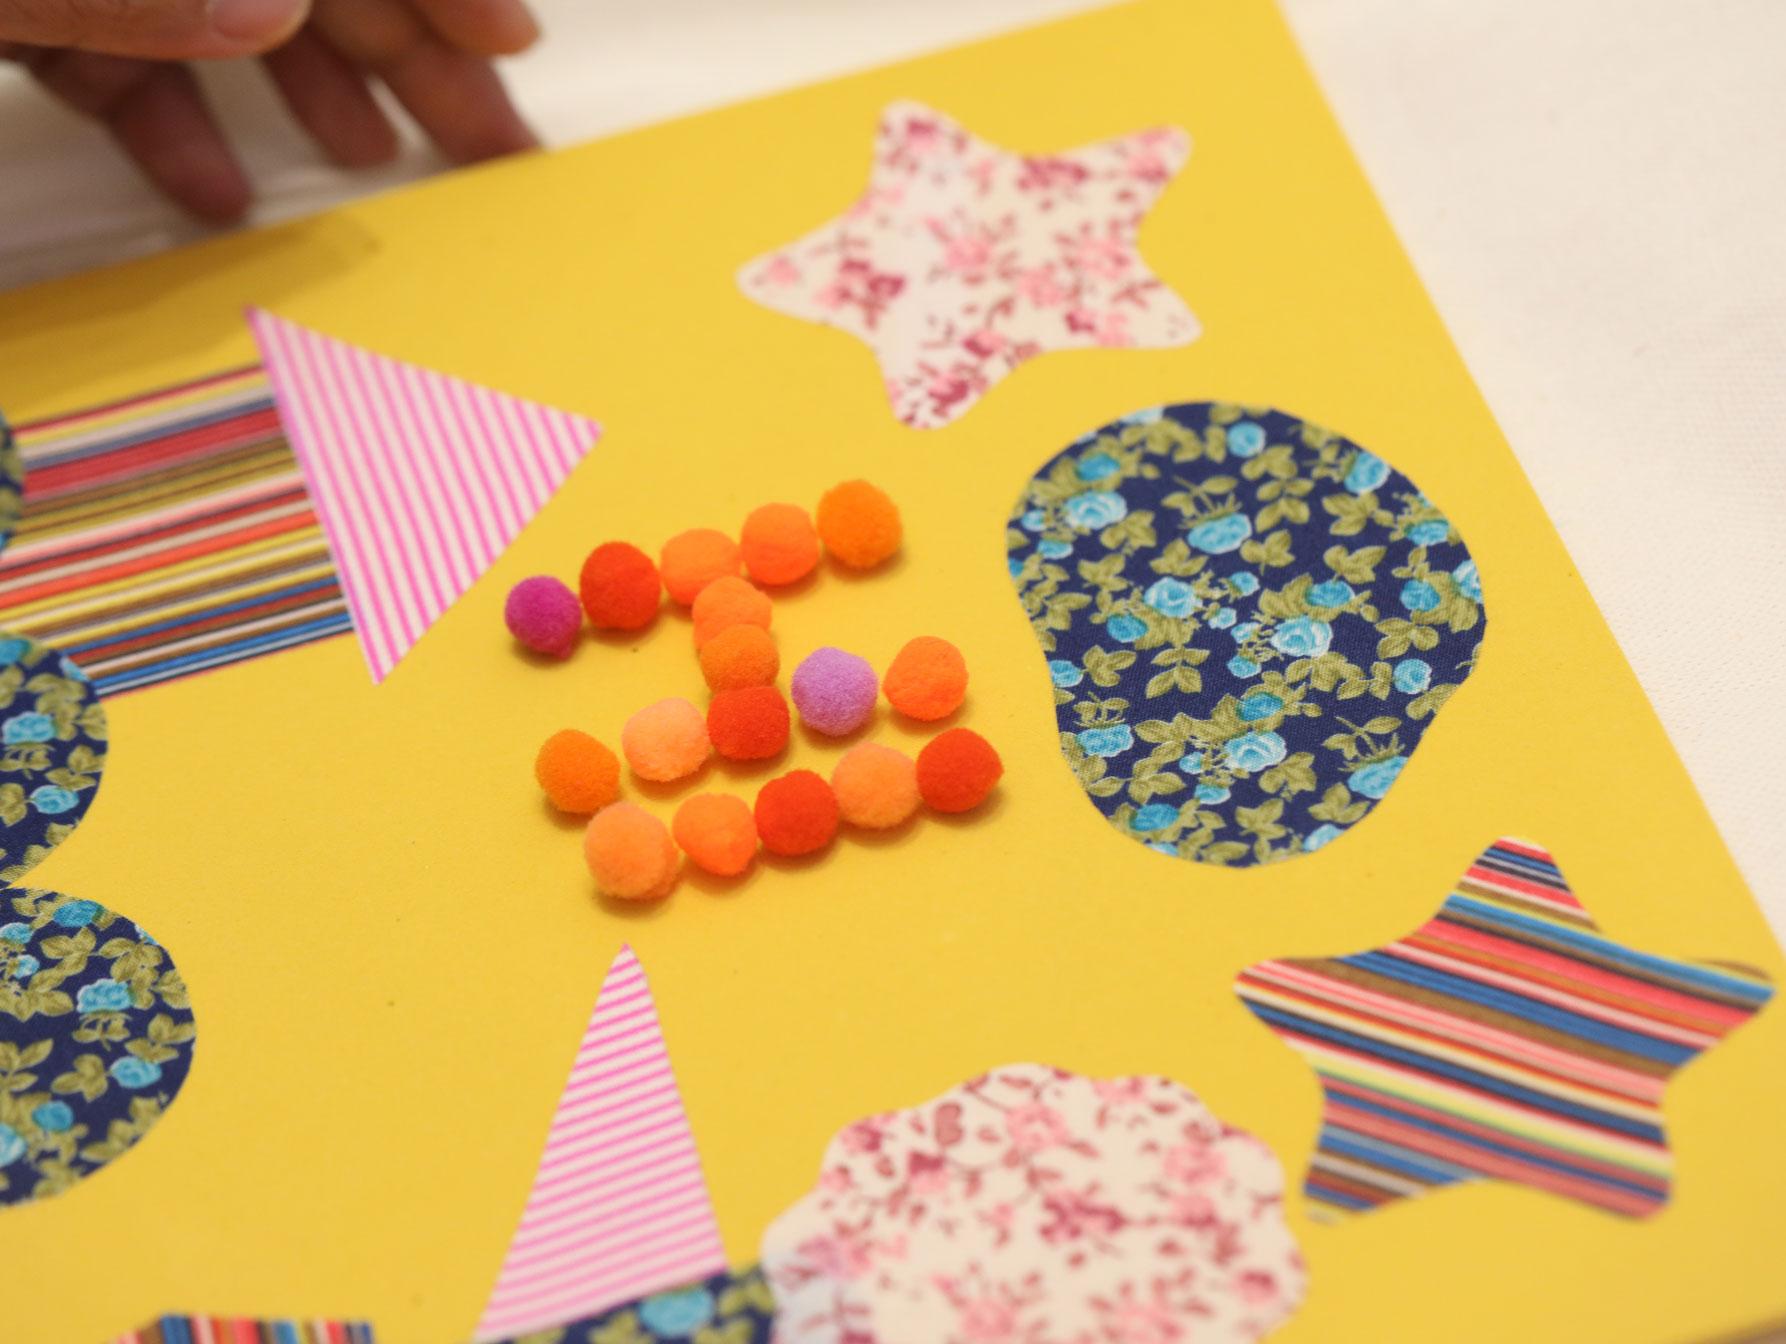 DIY Felt and Foam Projects with Craft Easy | Googly Gooeys | DIY Tote Bag Workshop